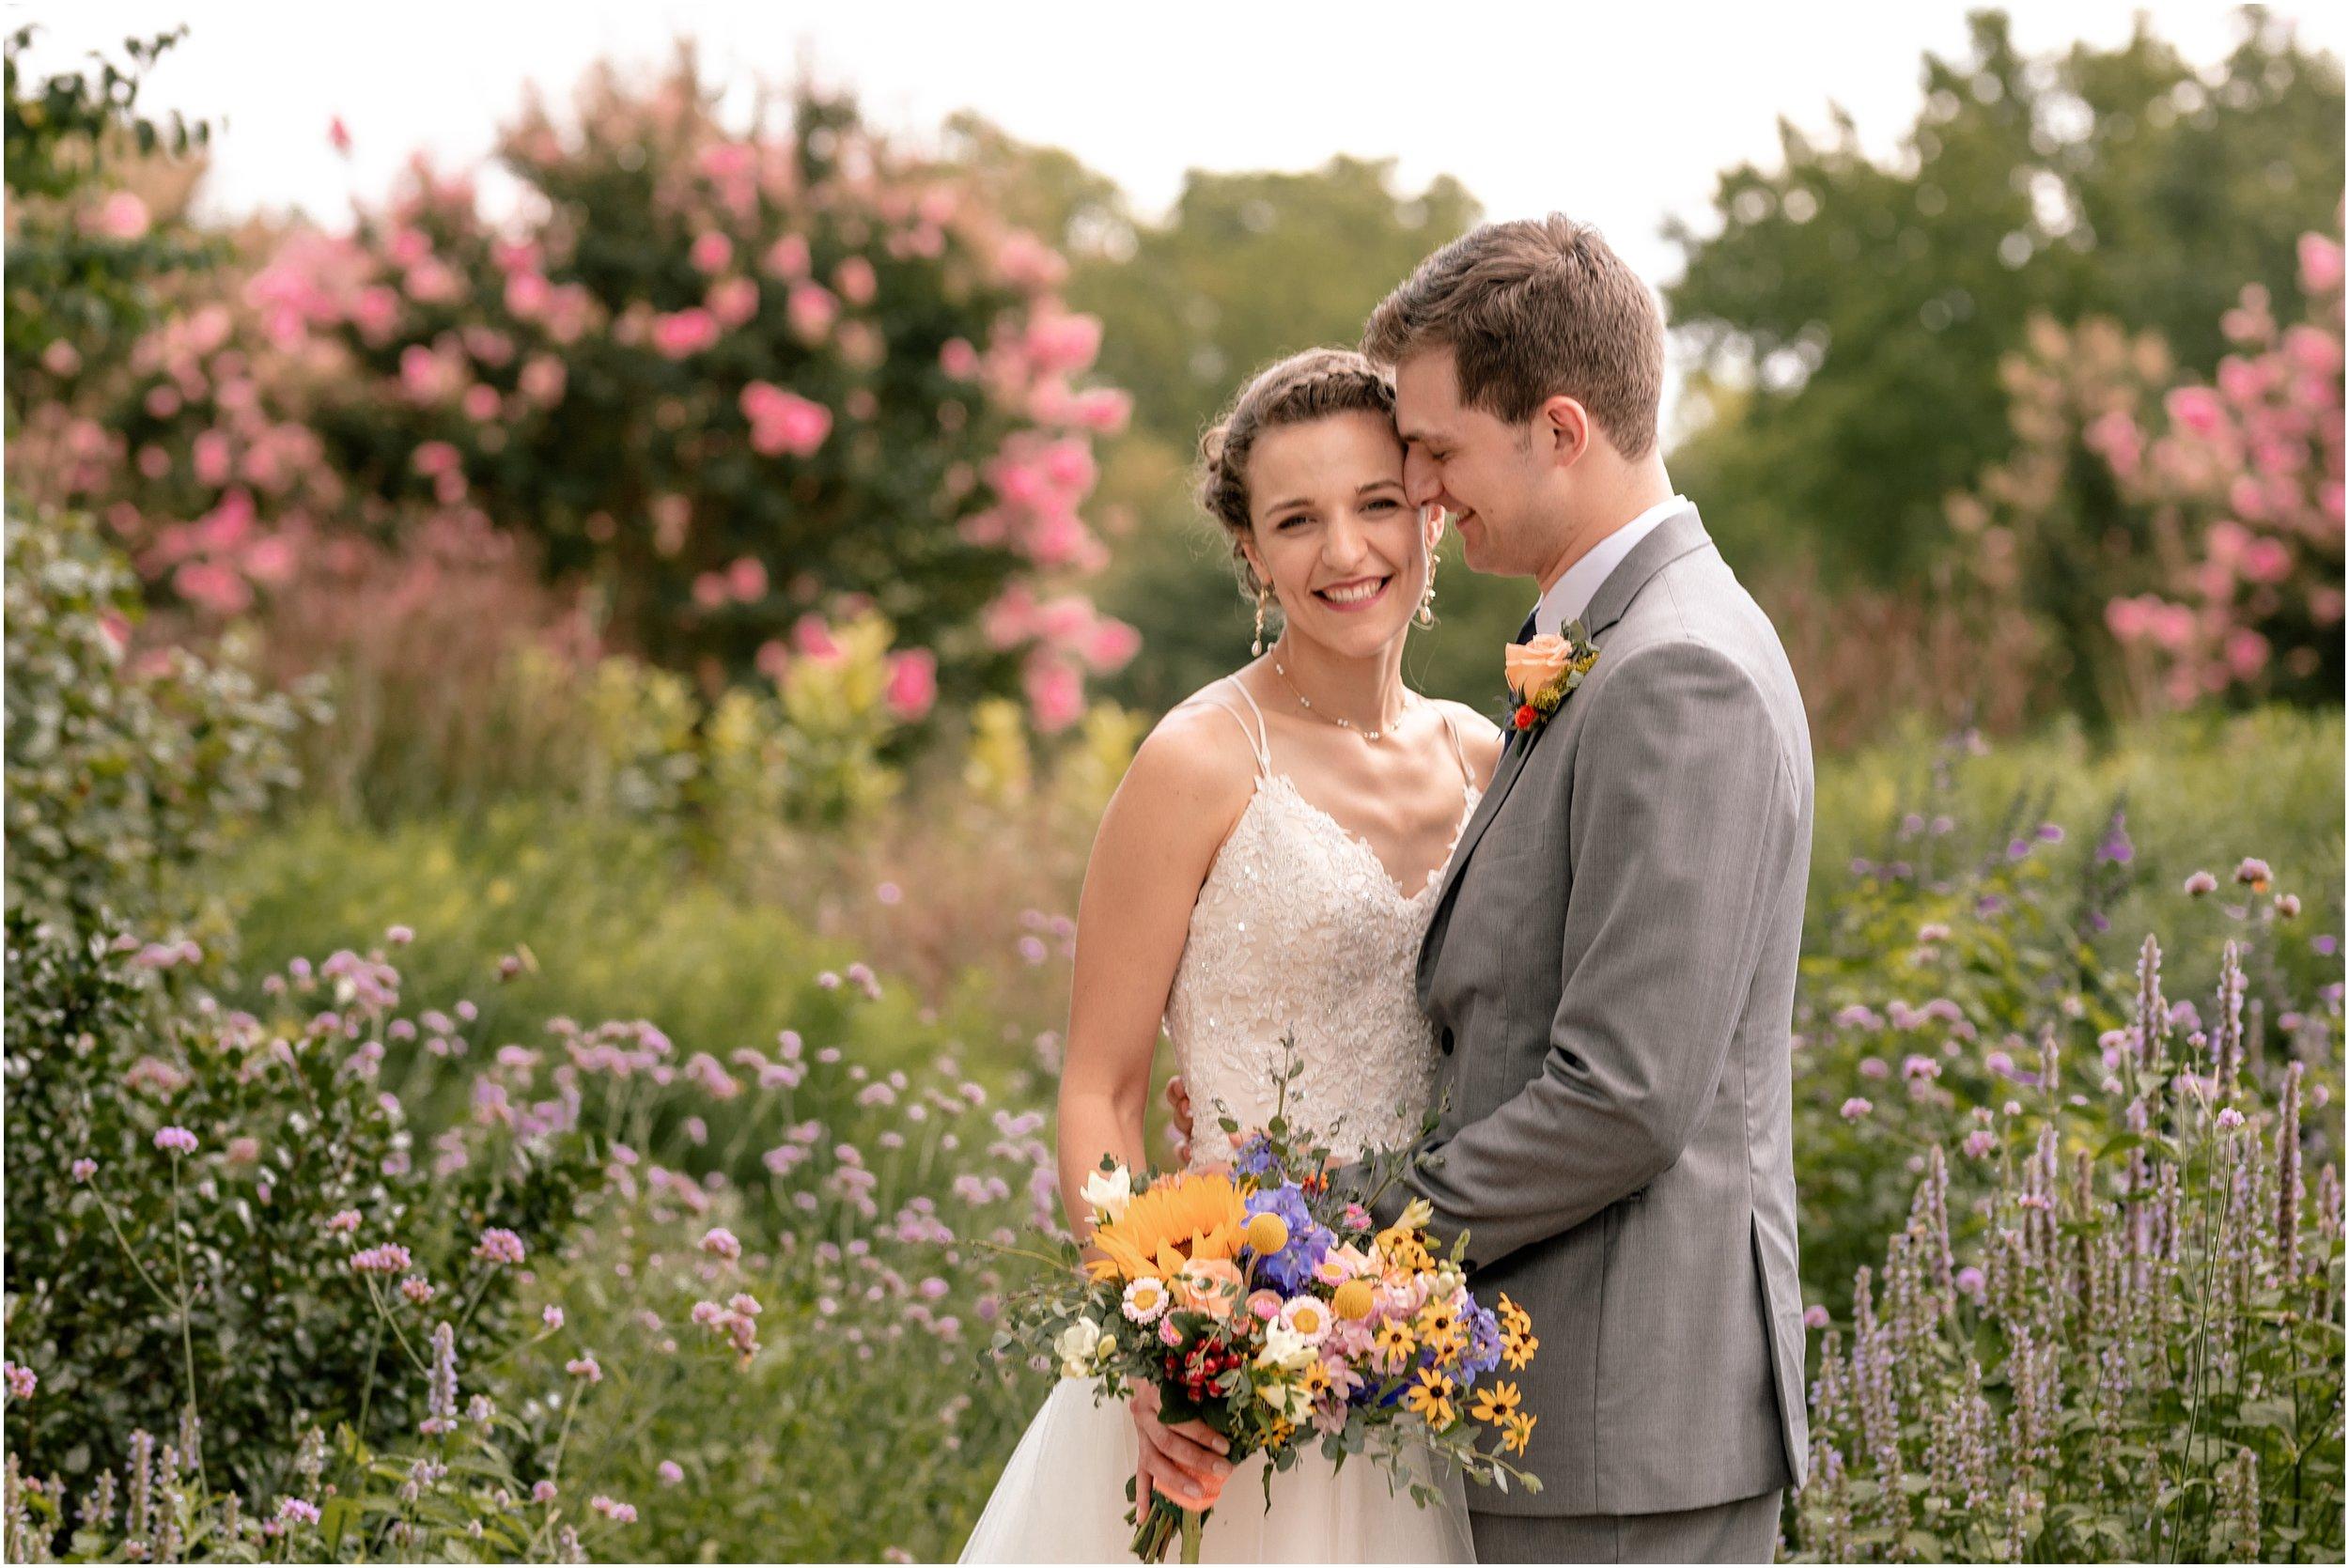 hannah leigh photography Cylburn Arboretum Wedding Baltimore, MD_3418.jpg